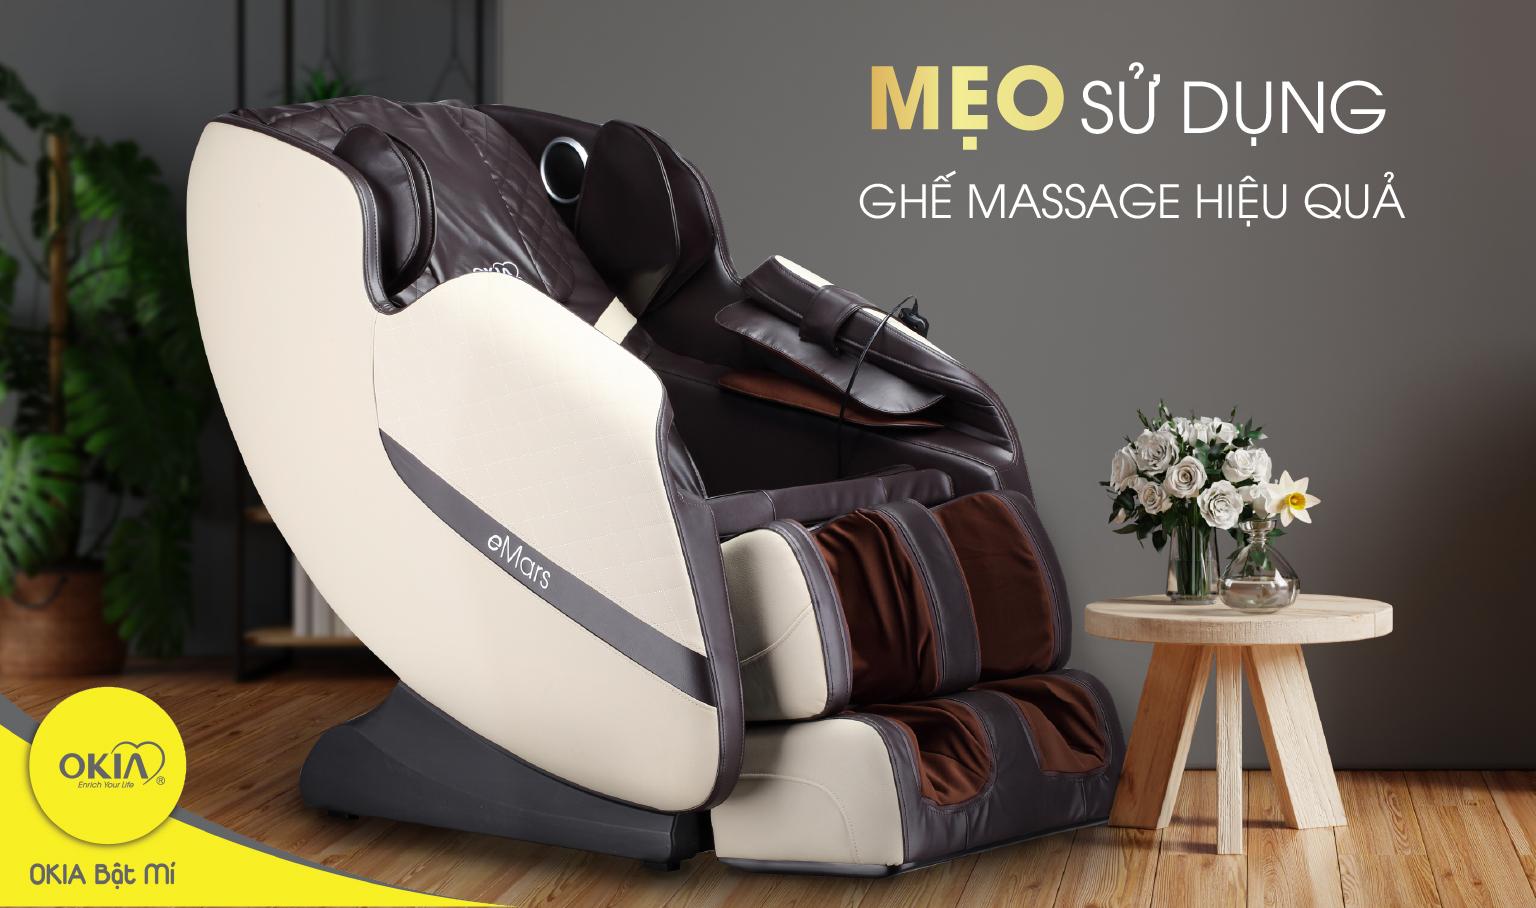 Mẹo sử dụng ghế massage0